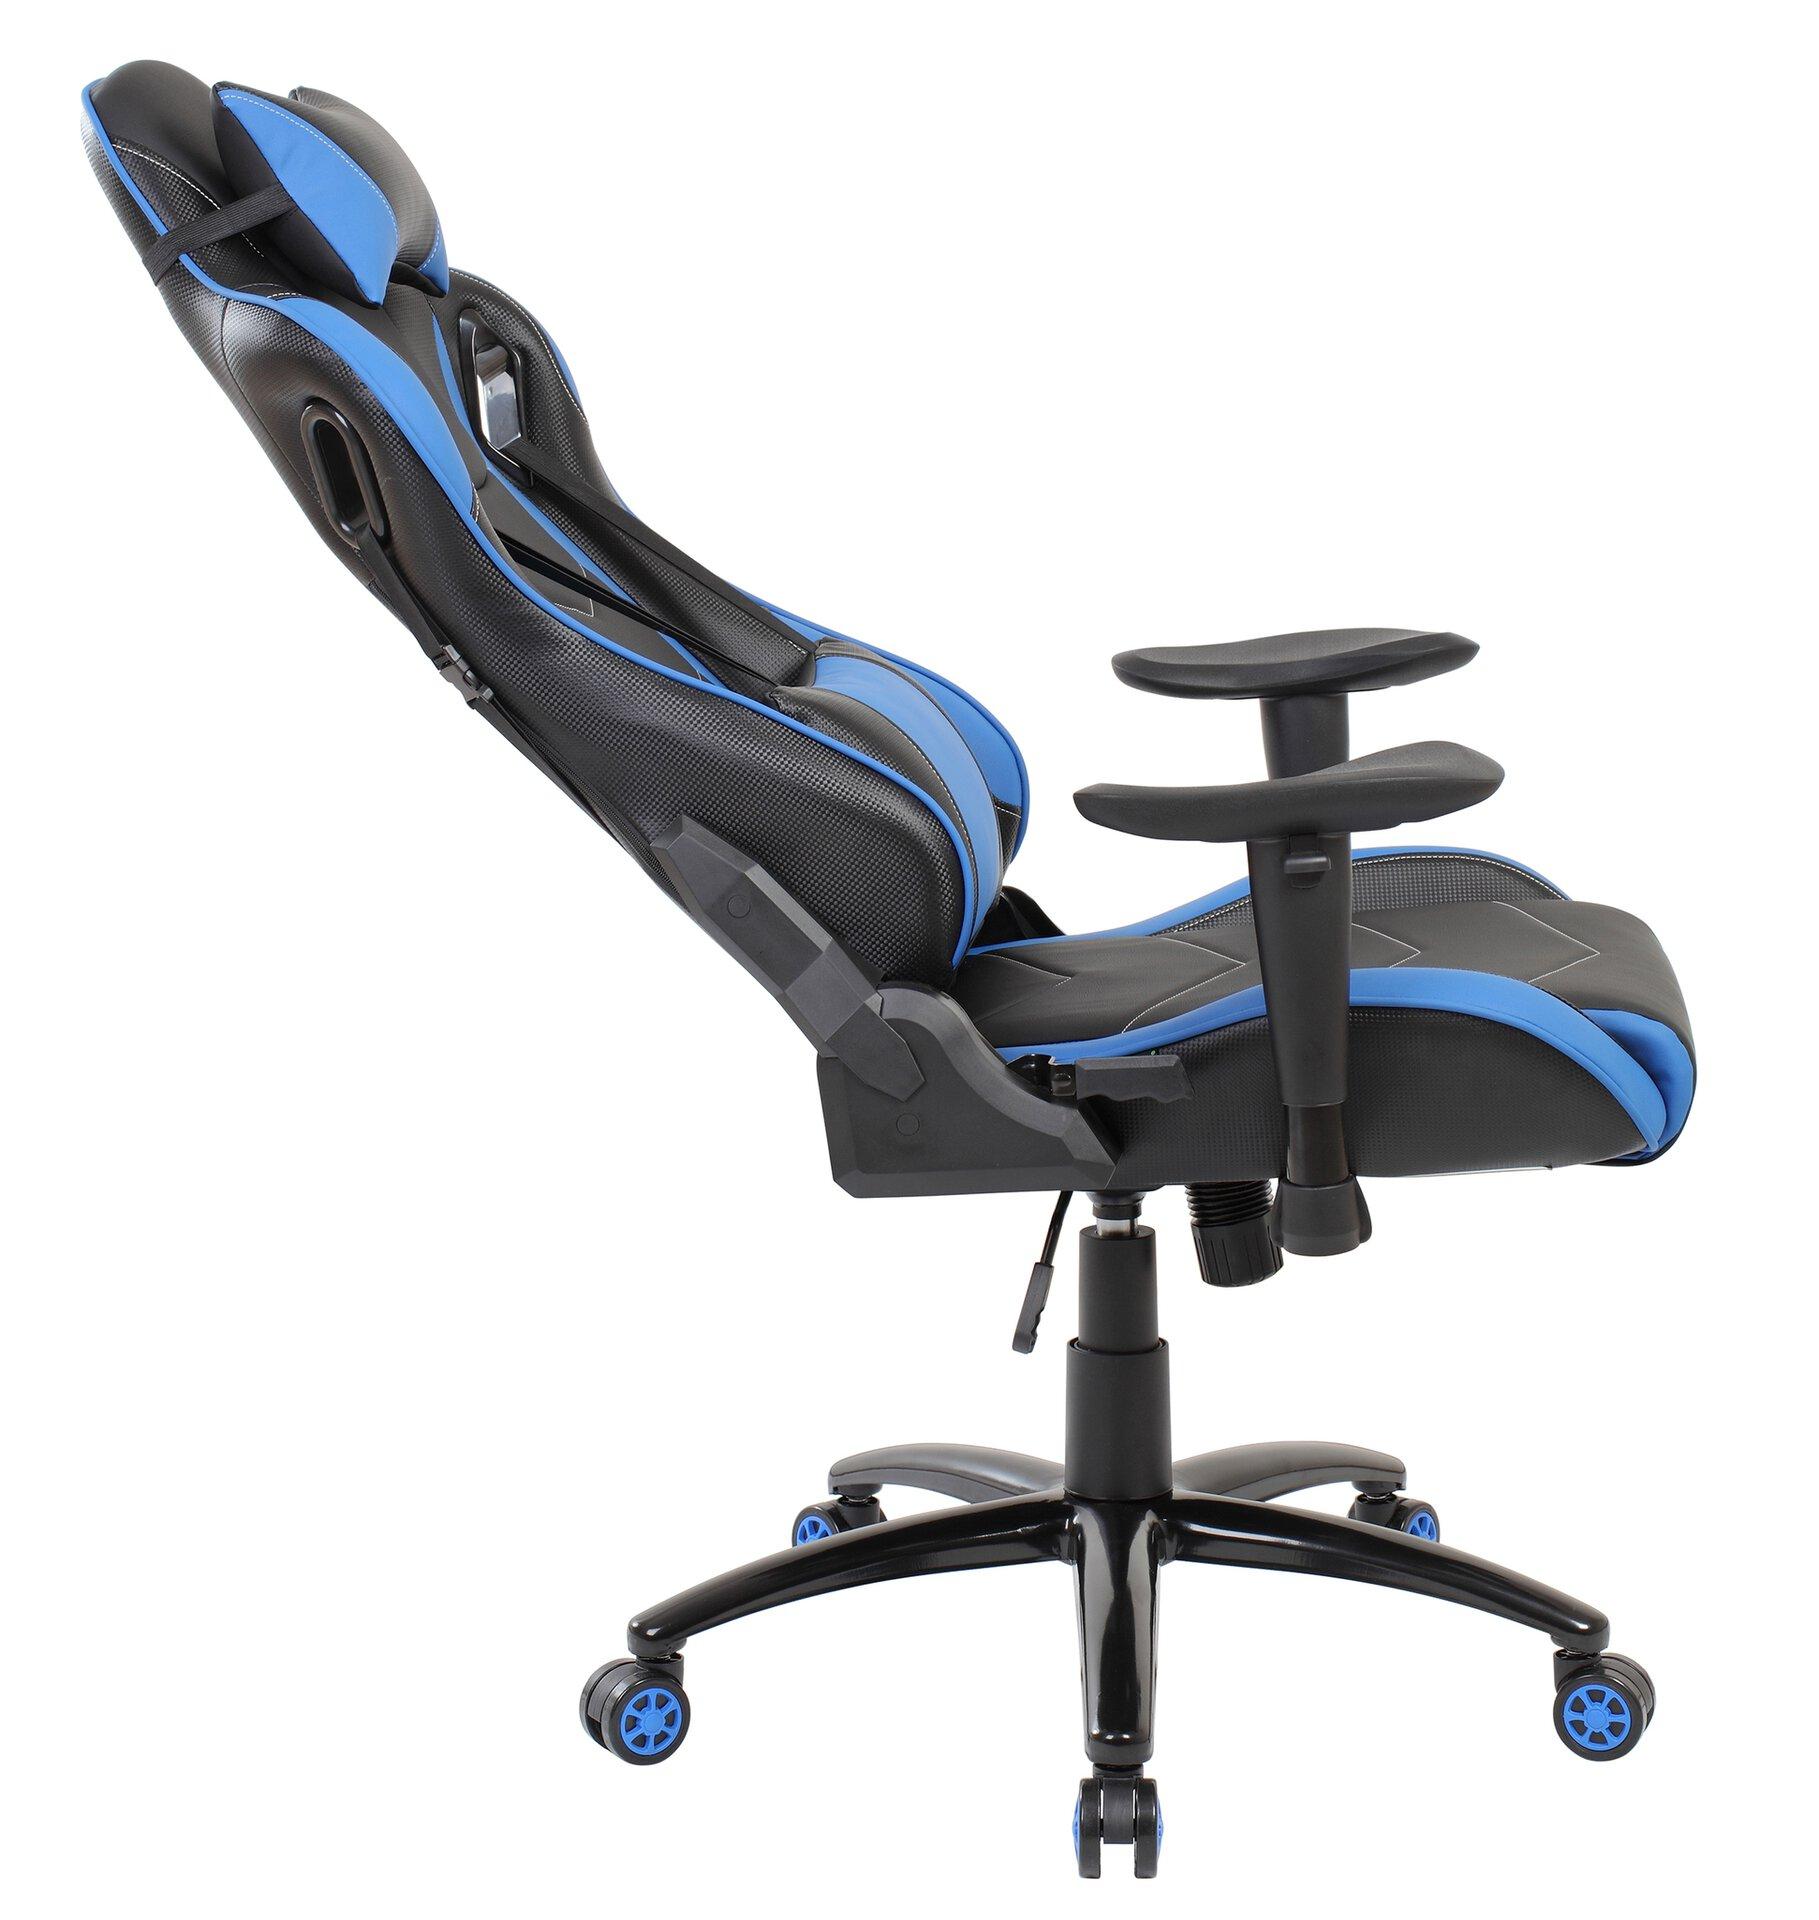 Büro-Drehstuhl CELECT Textil schwarz 76 x 141 x 54 cm